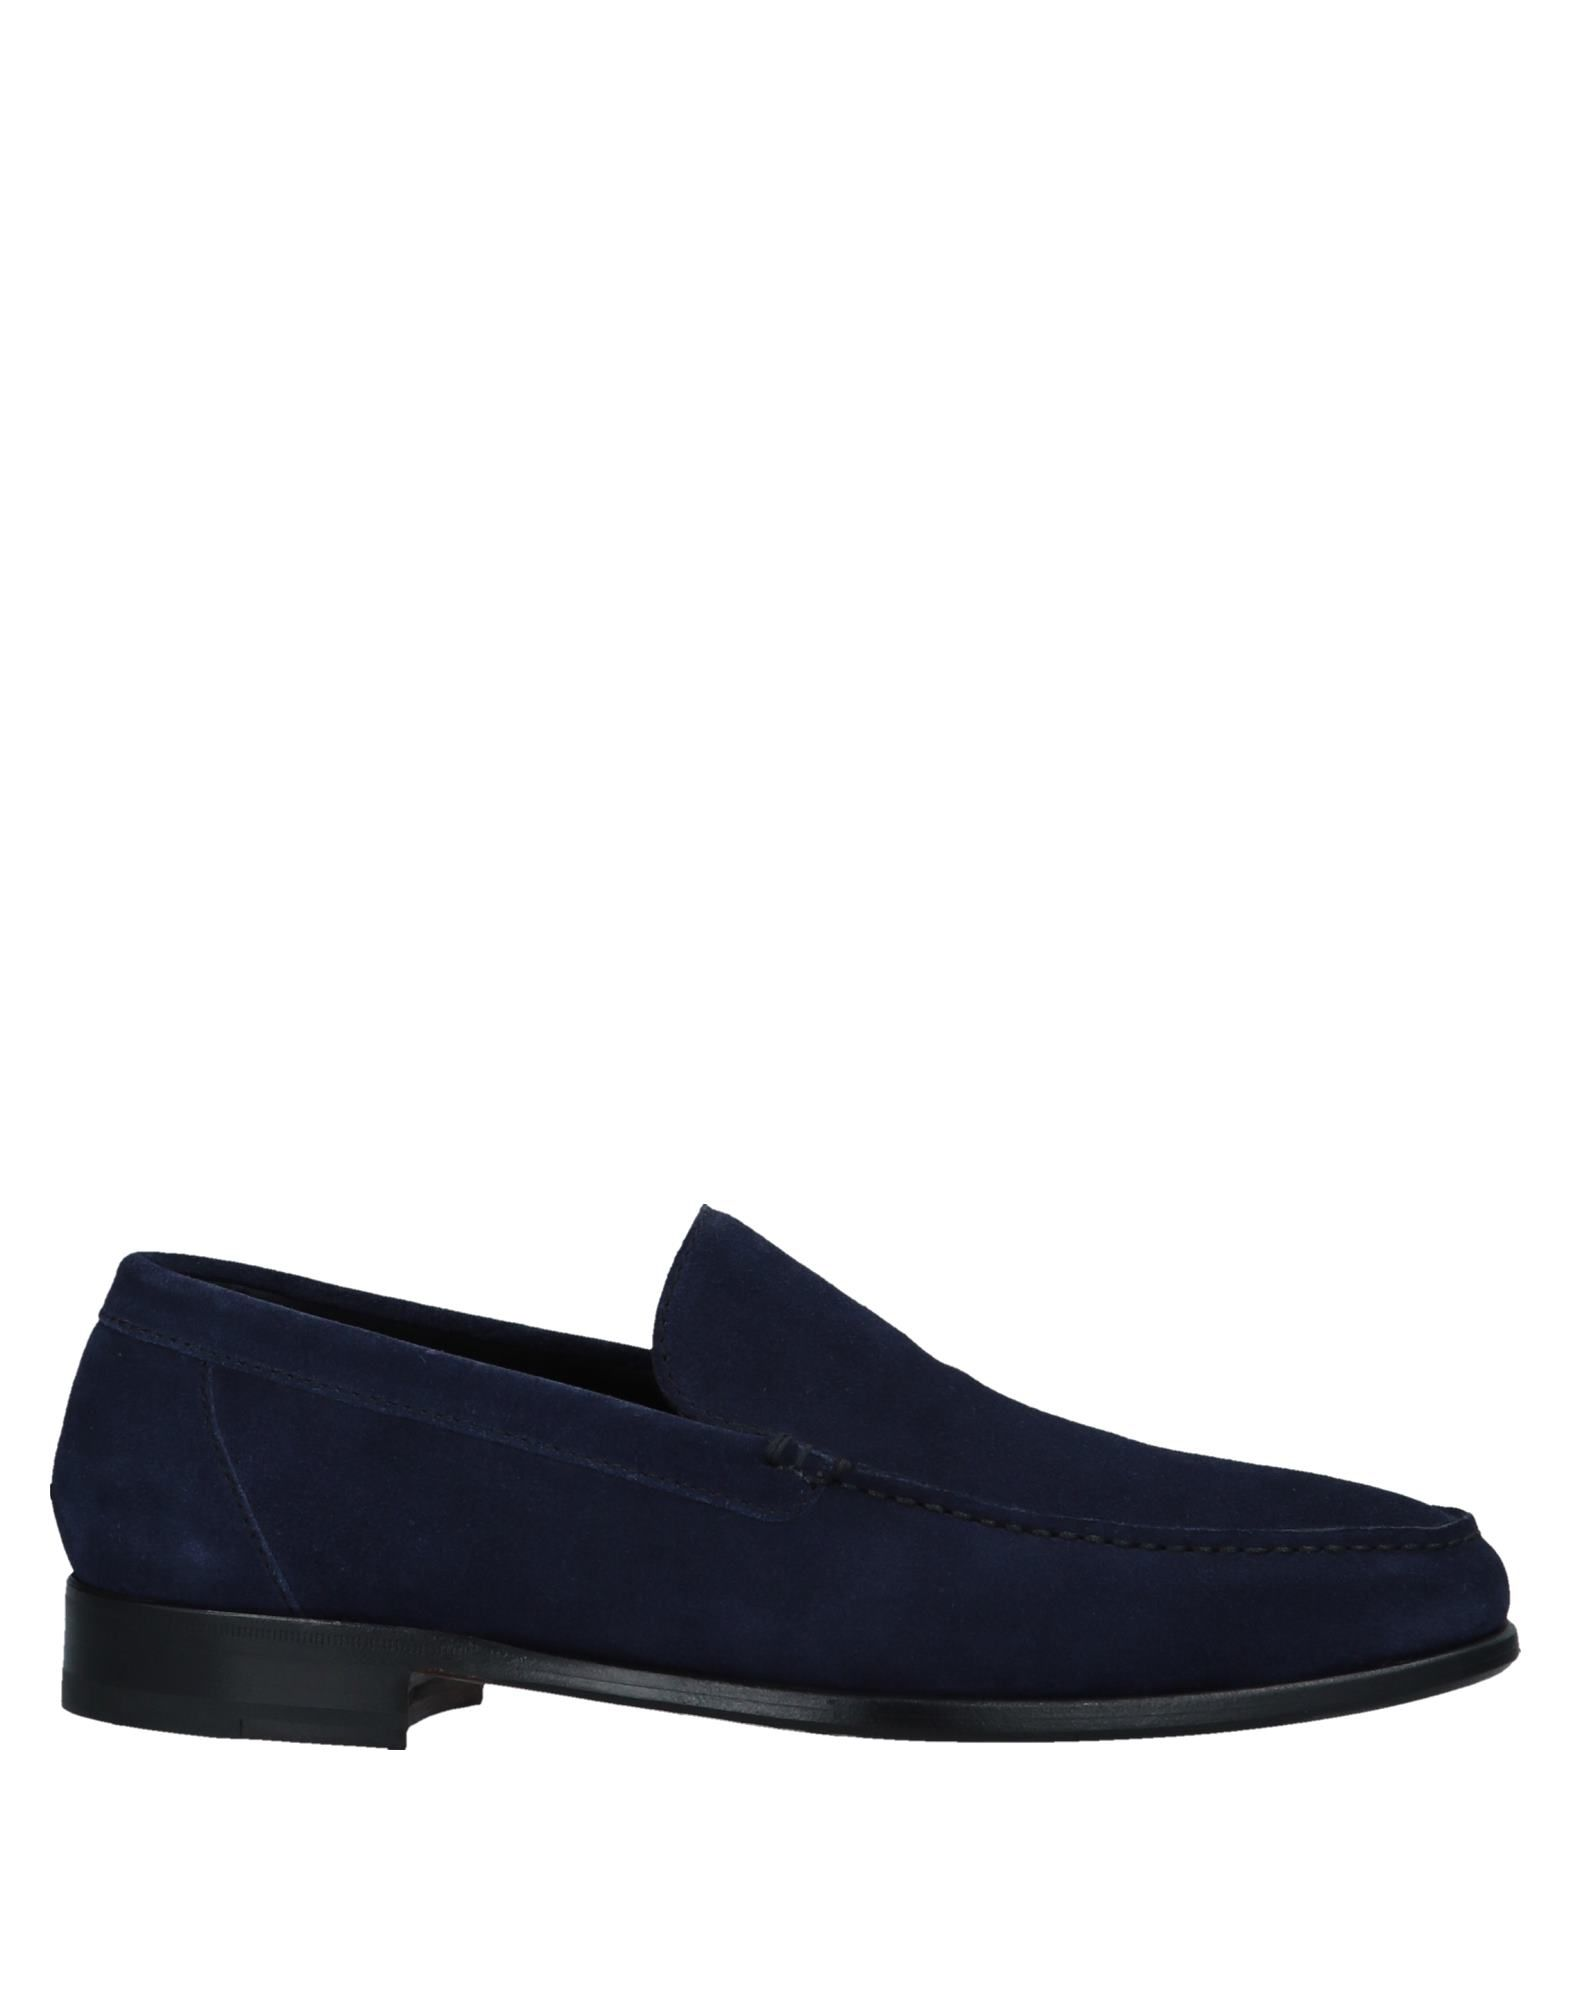 A.Testoni Mokassins Herren  11542430EH Gute Qualität beliebte Schuhe